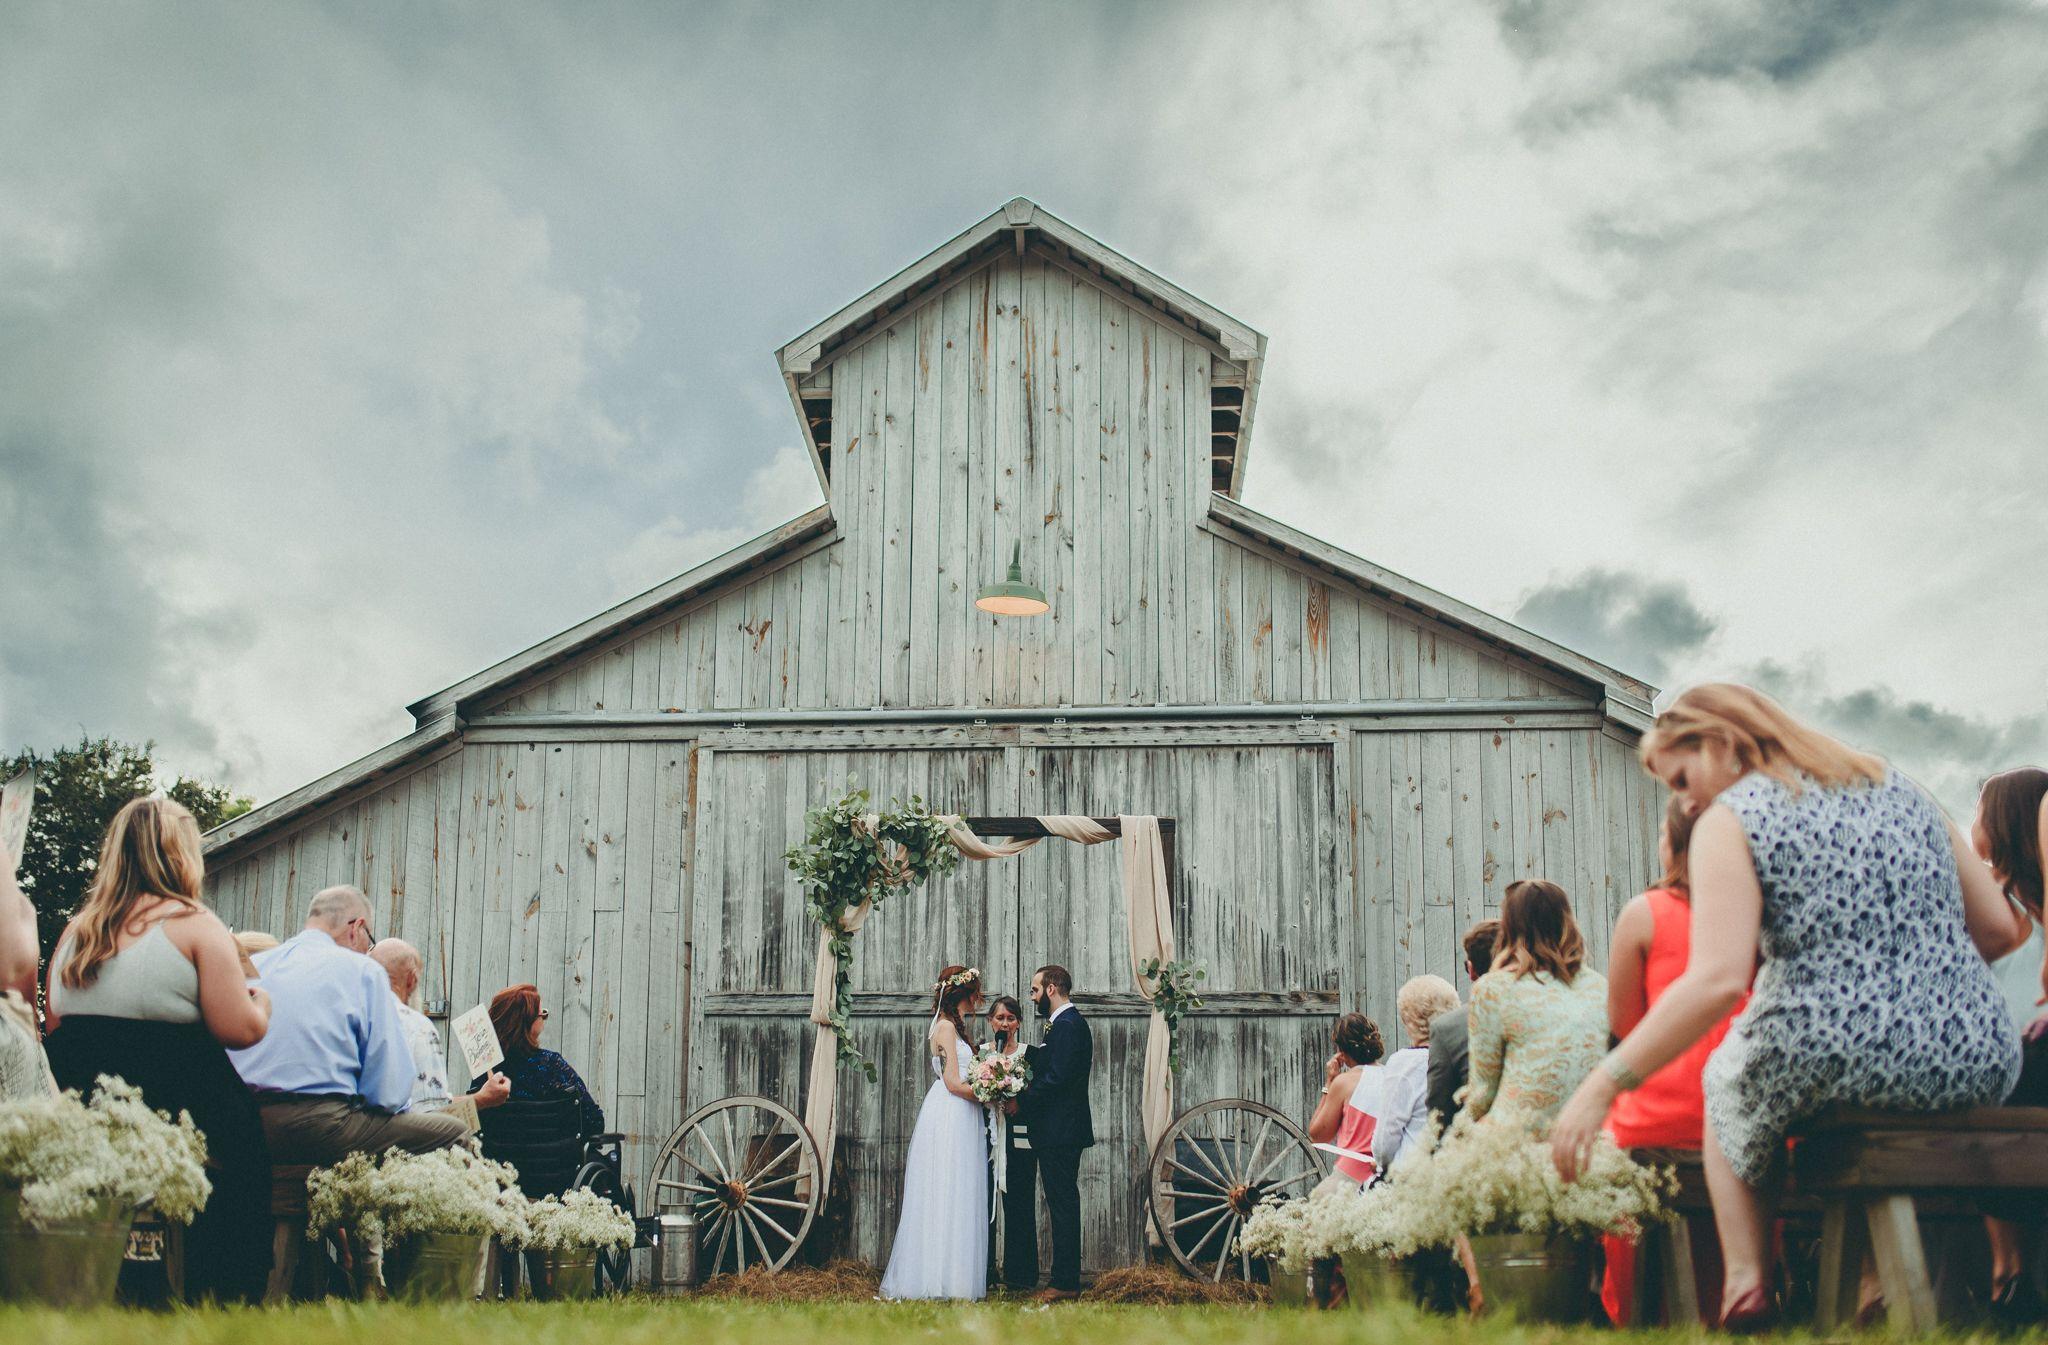 Barn wedding - Wedding inspiration - Wedding photography ...